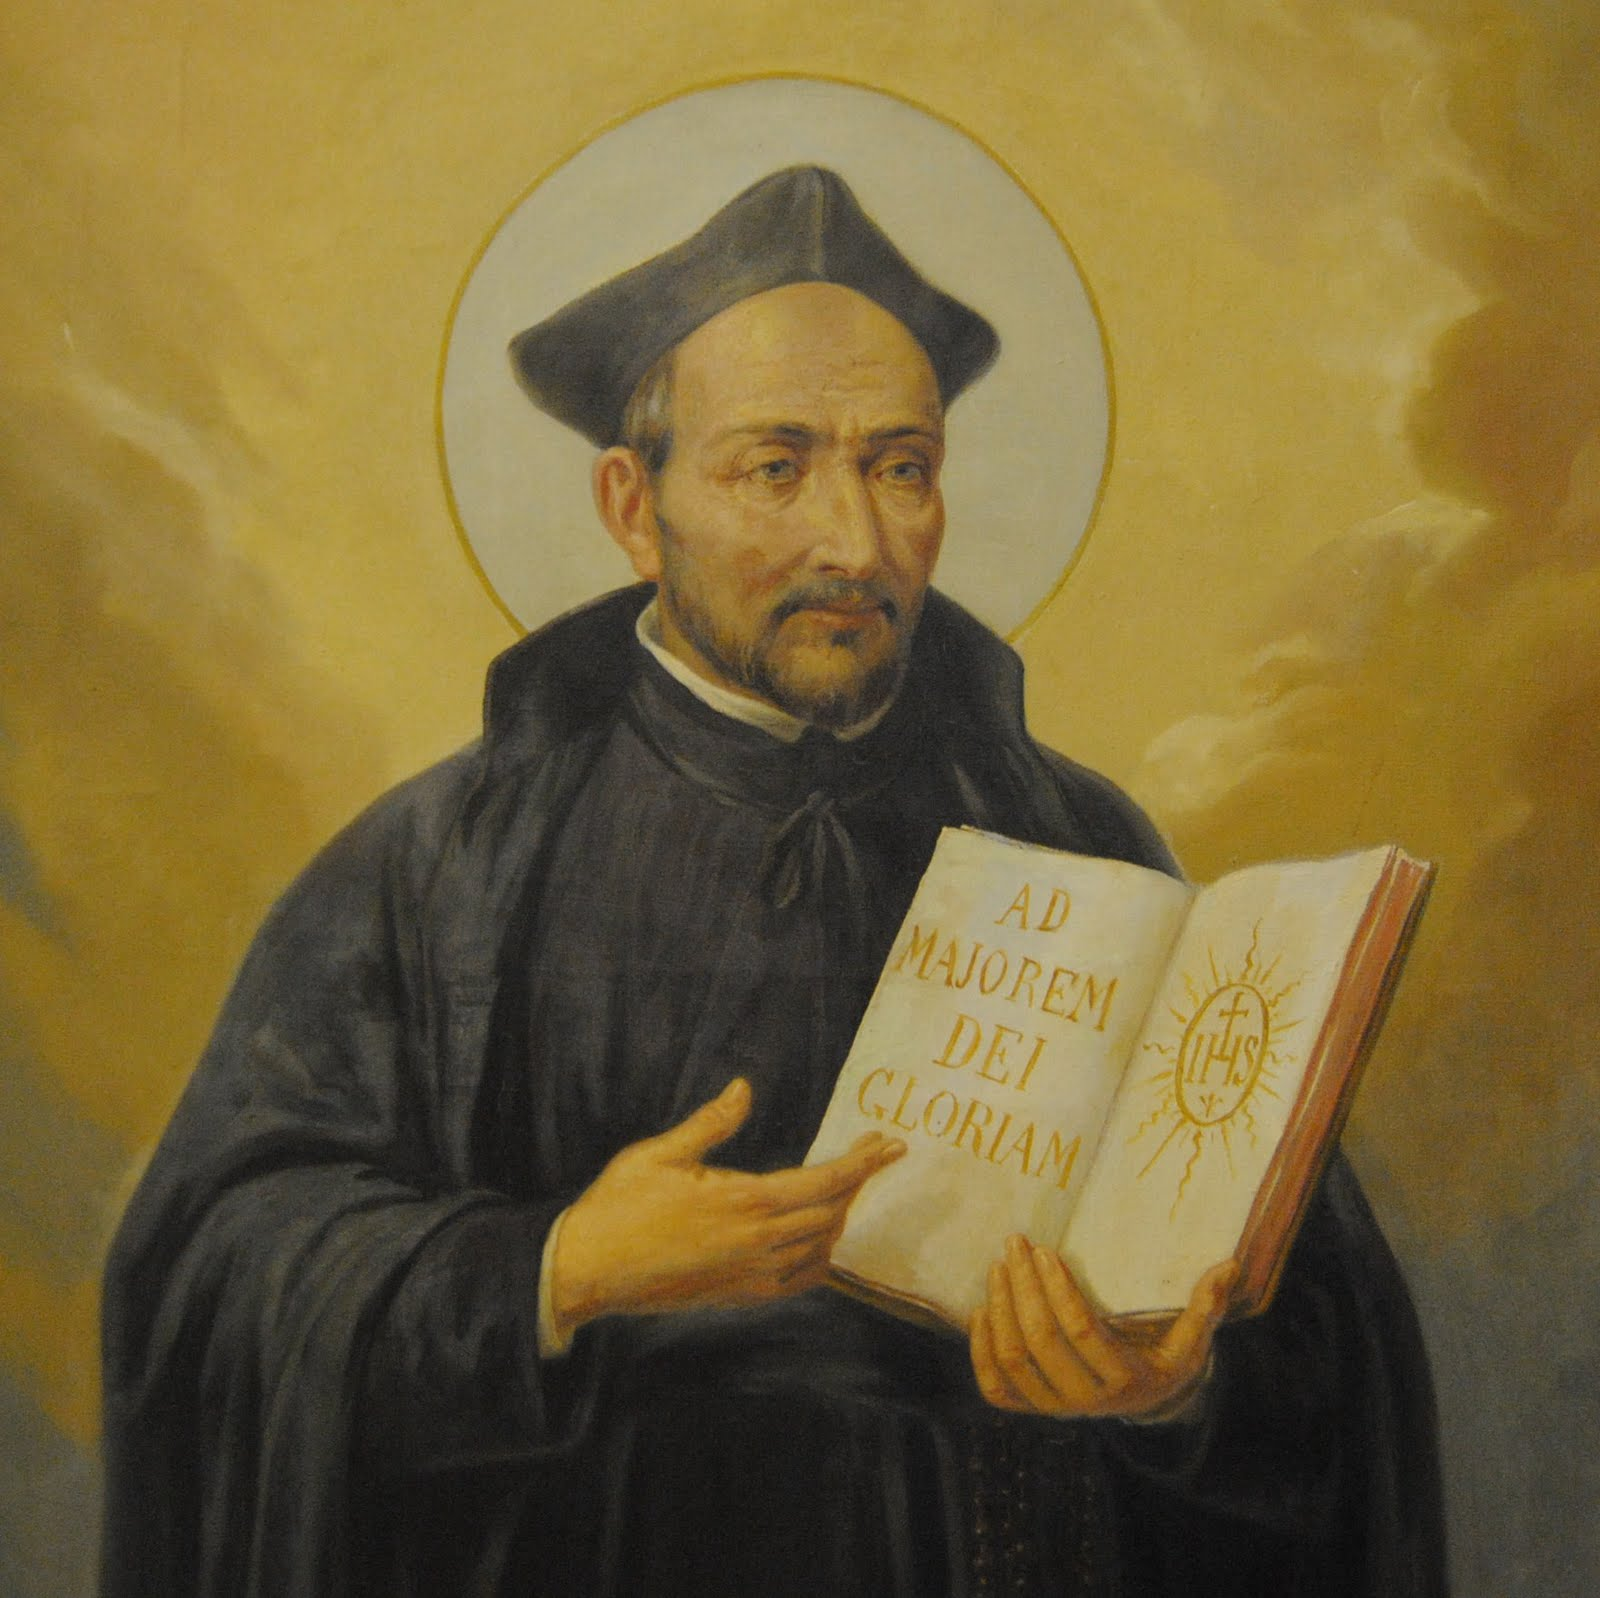 Early Life of St. Ignatius